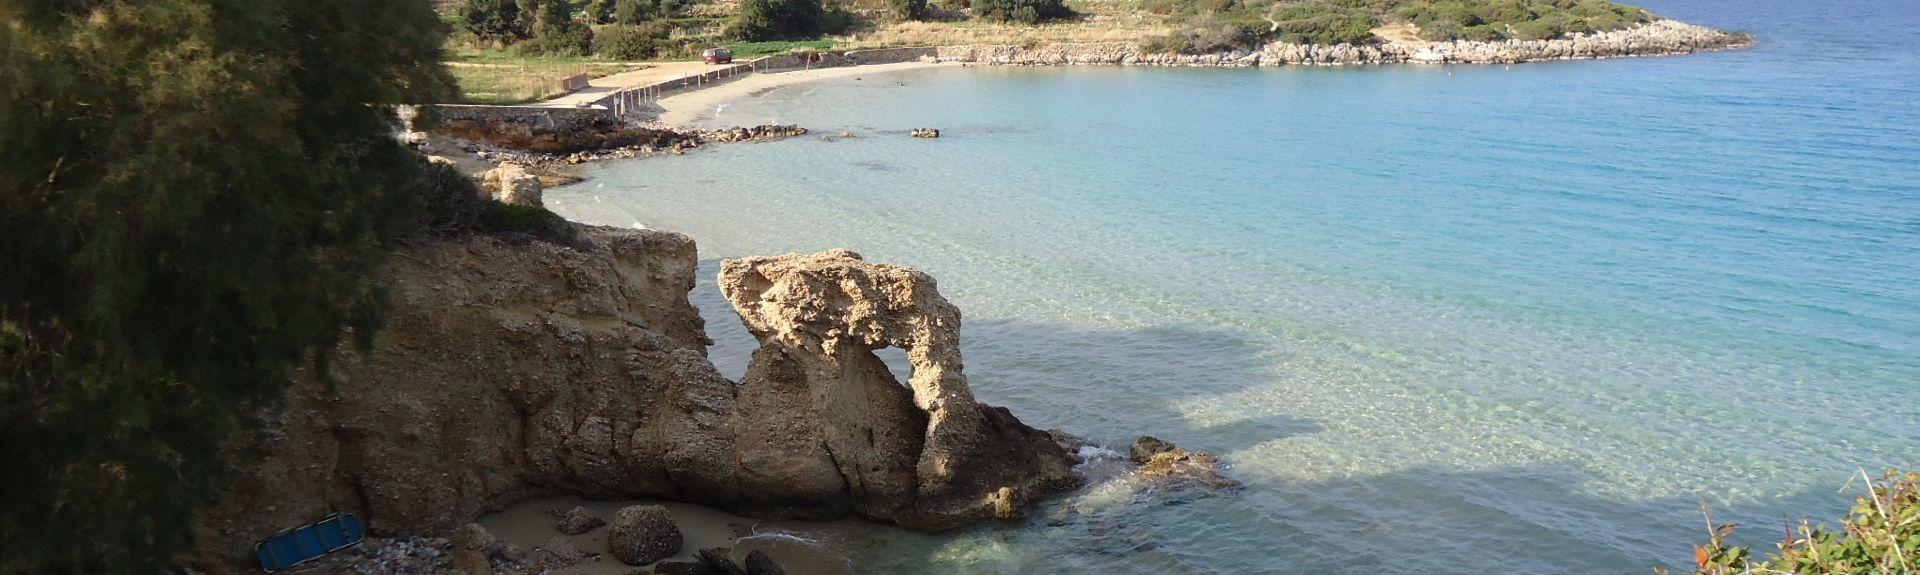 Anatoli, Isla de Creta, Grecia